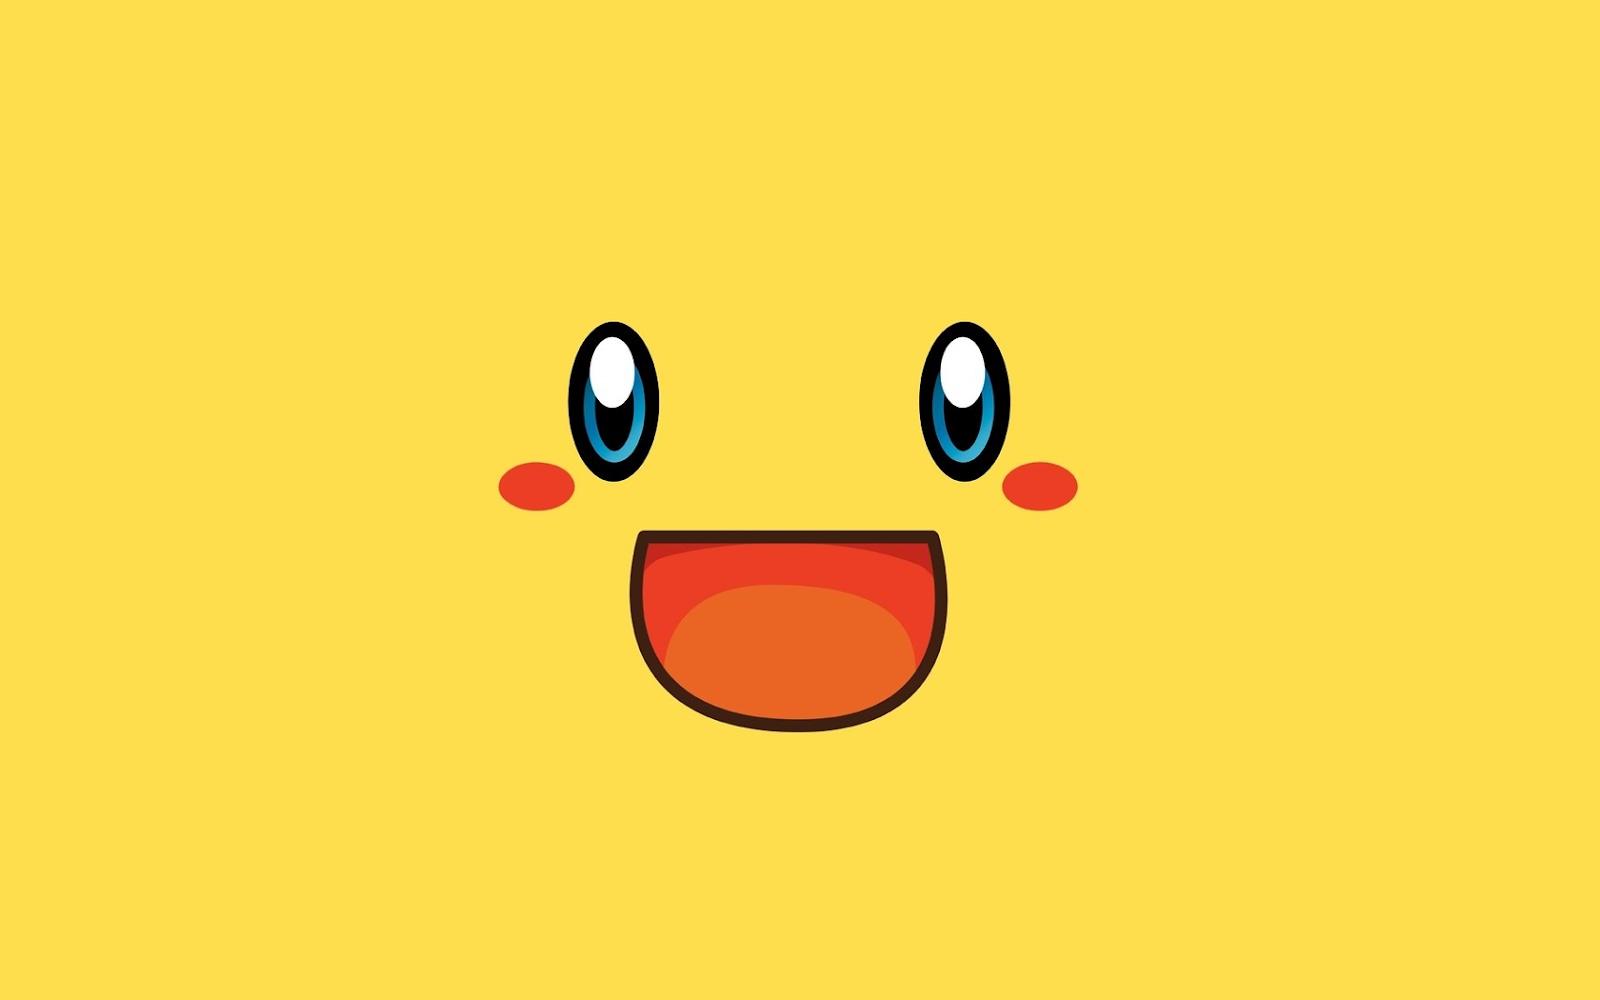 Pikachu Smiling Face Minimalist HD WallpaperPikachu Face Wallpaper